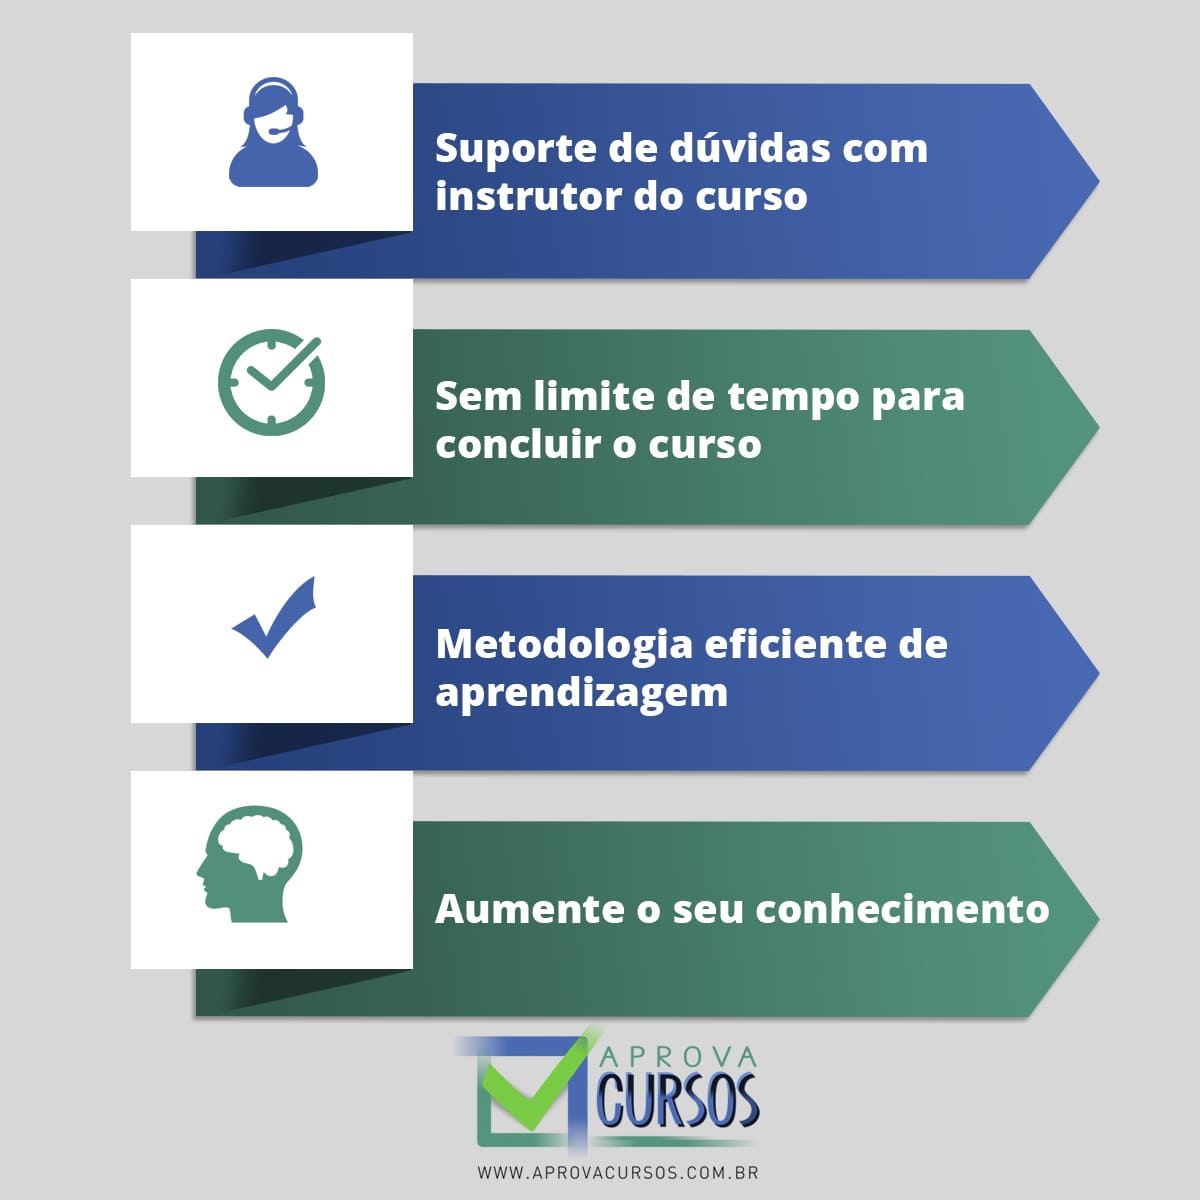 Curso Online de Psicologia Desportiva com Certificado  - Aprova Cursos